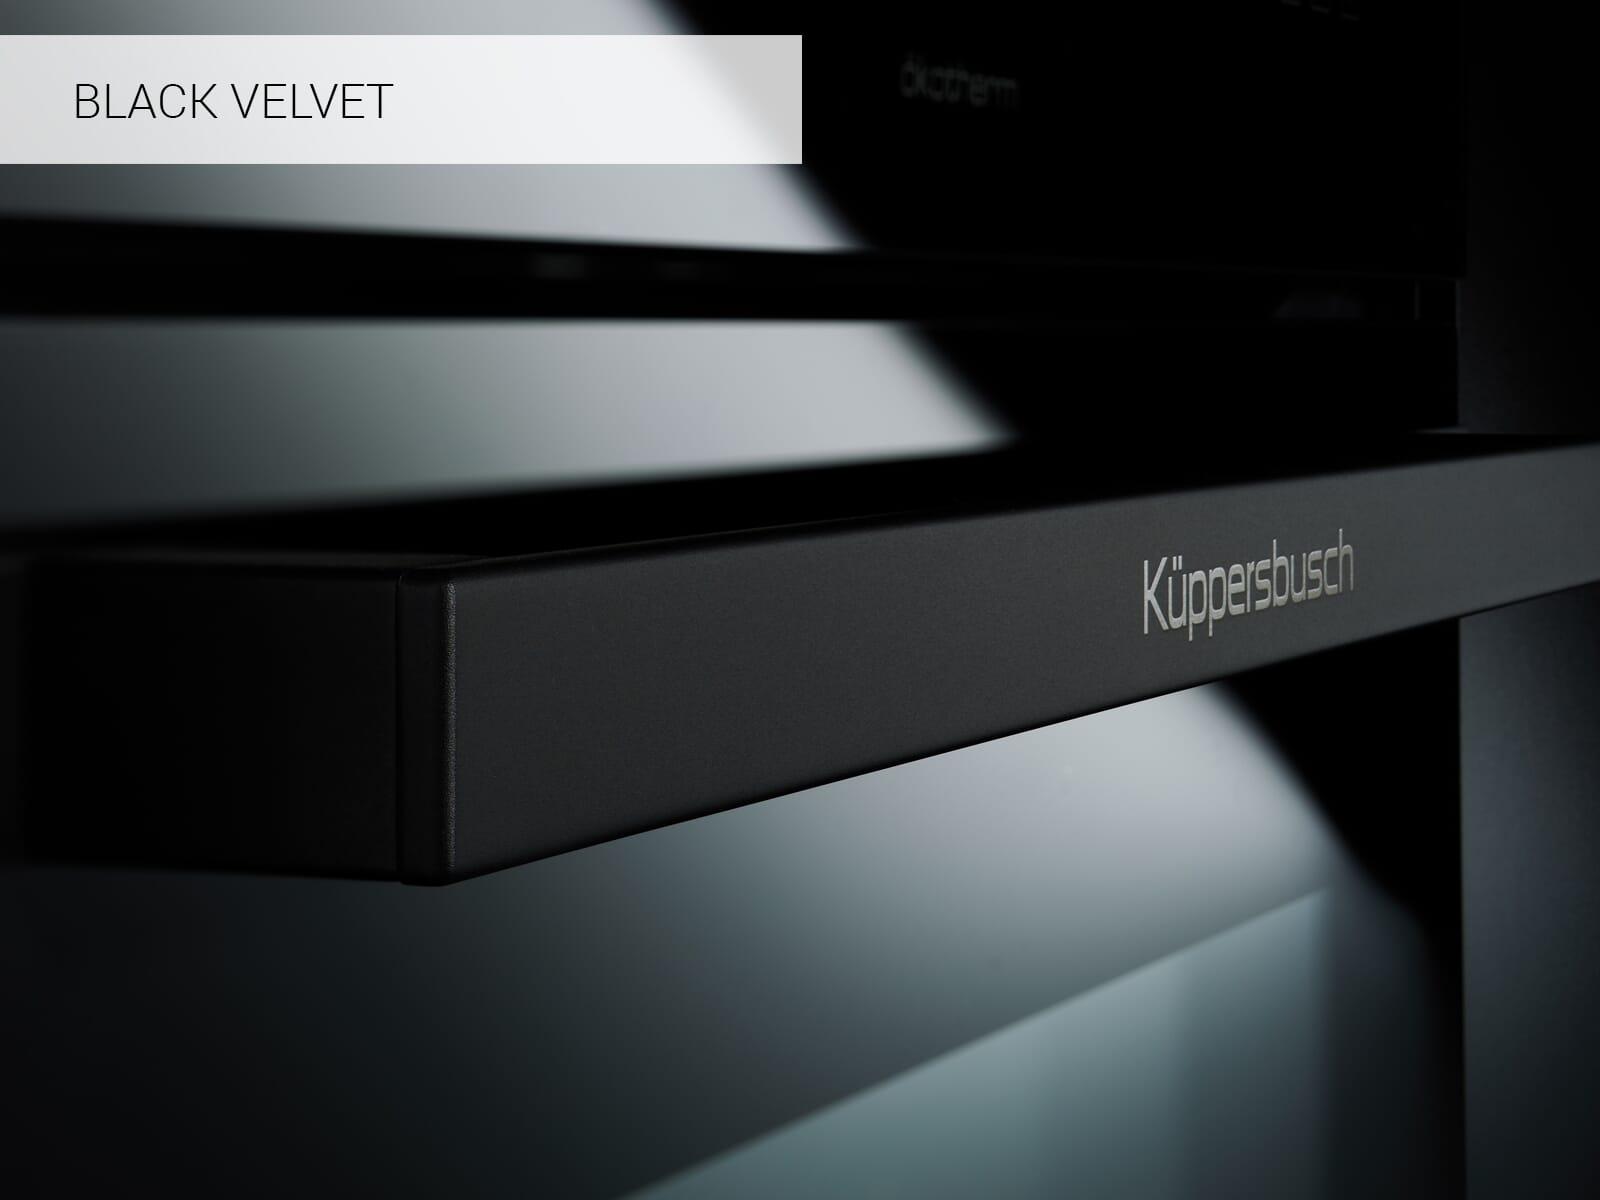 Küppersbusch B 6335.0 S5 Comfort+ Backofen Schwarz/Black Velvet